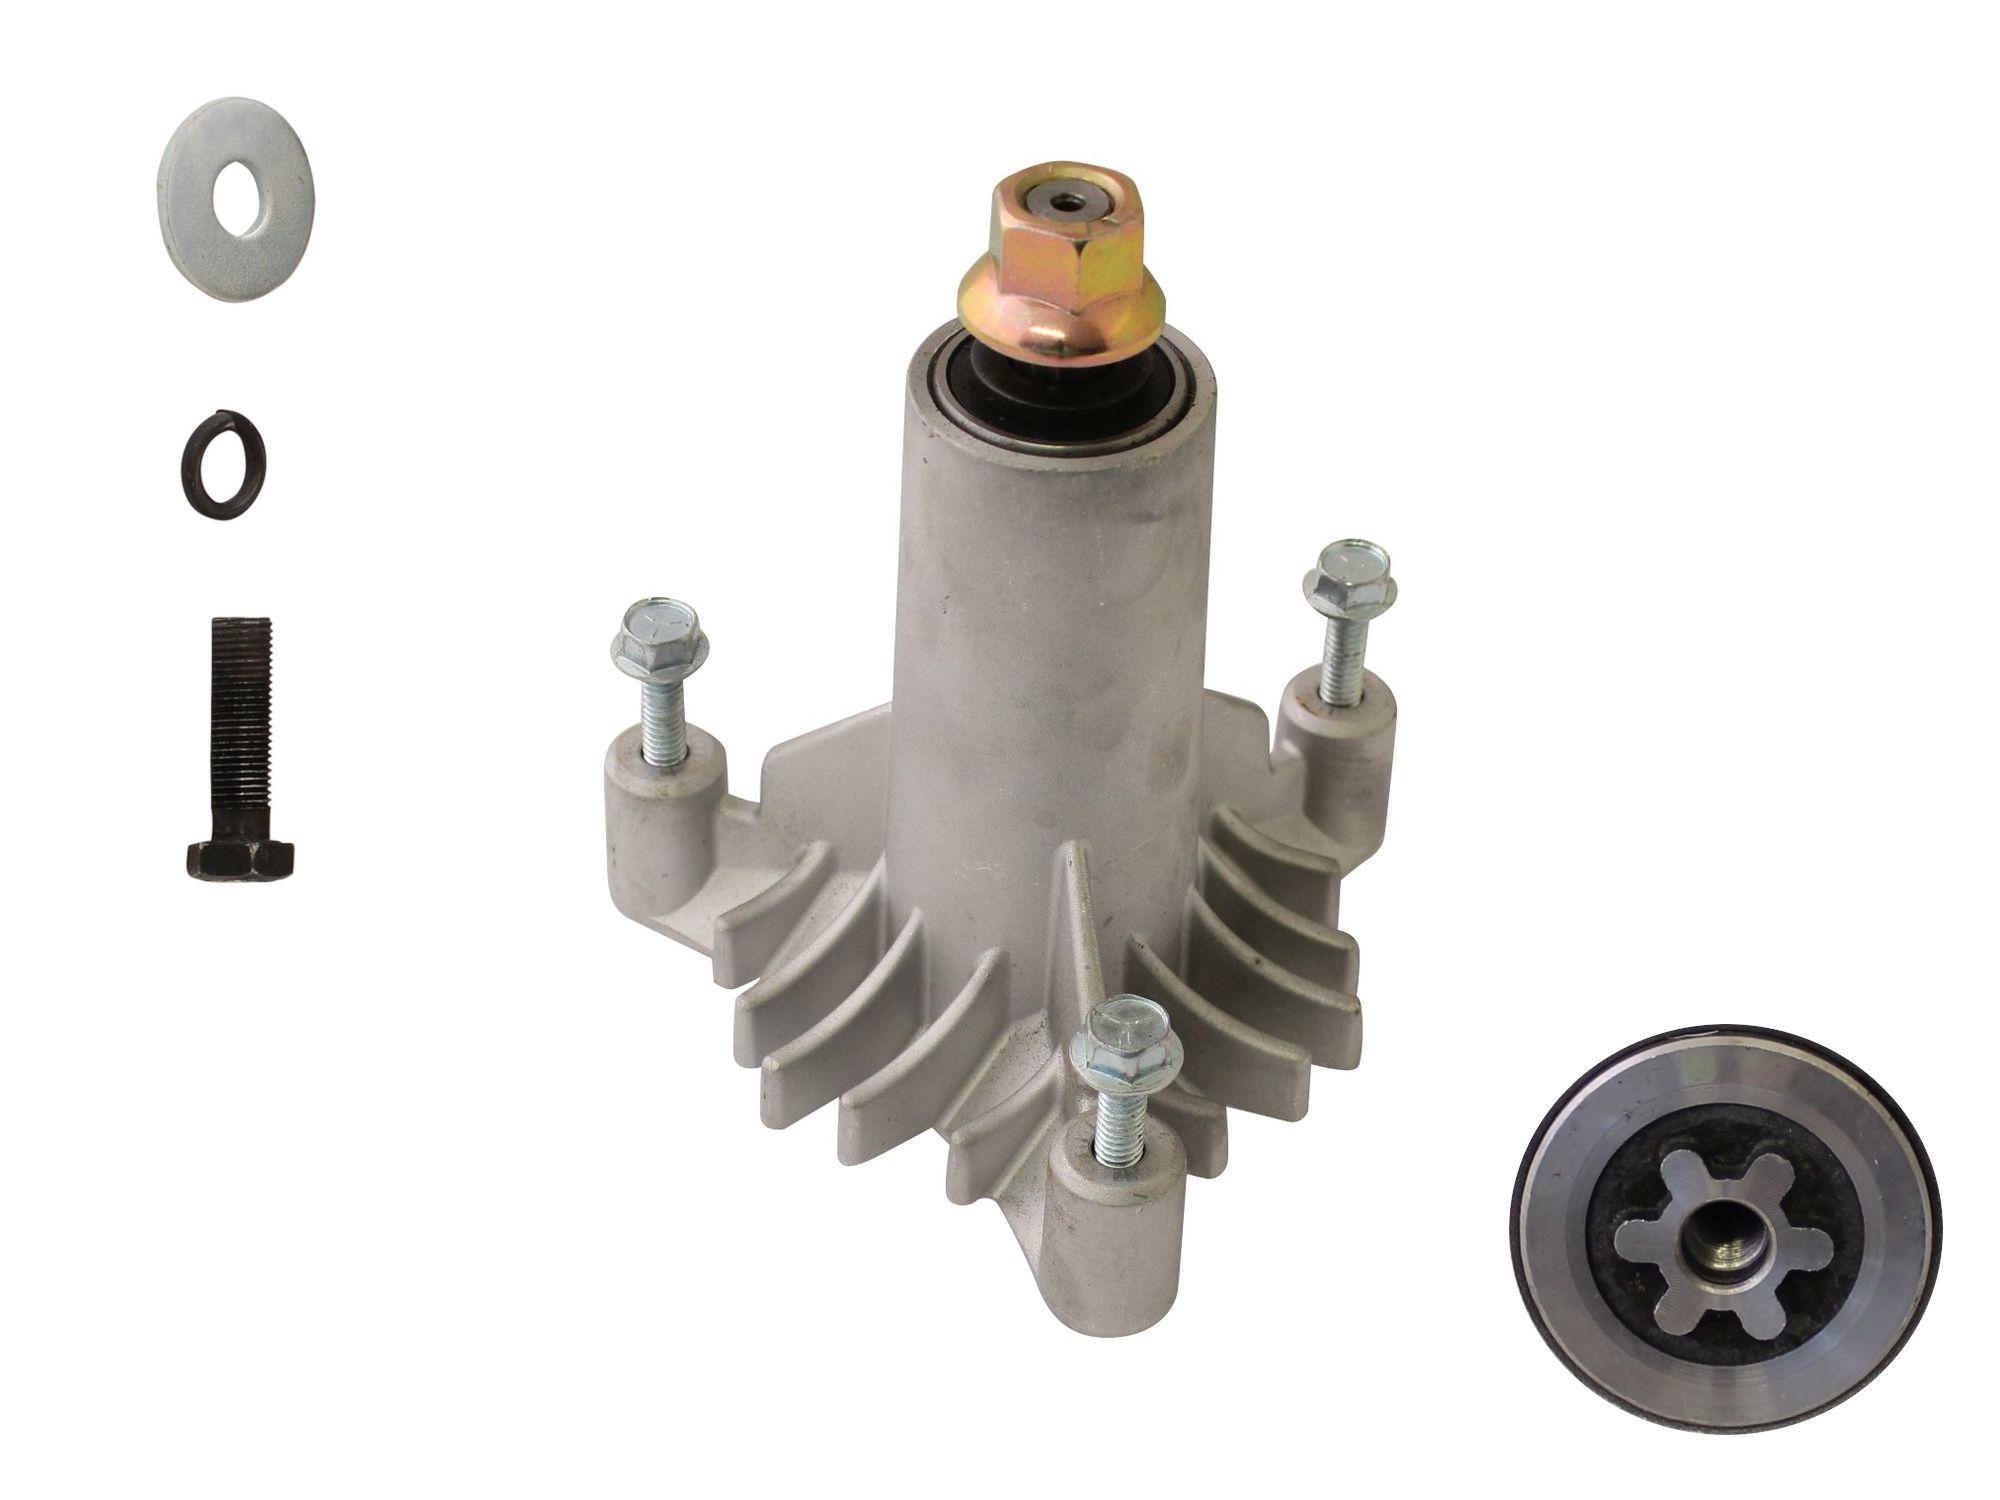 Zündschloss 7-Pol passend EFCO STORM 108//20H 13BT79KG637 Rasentraktor